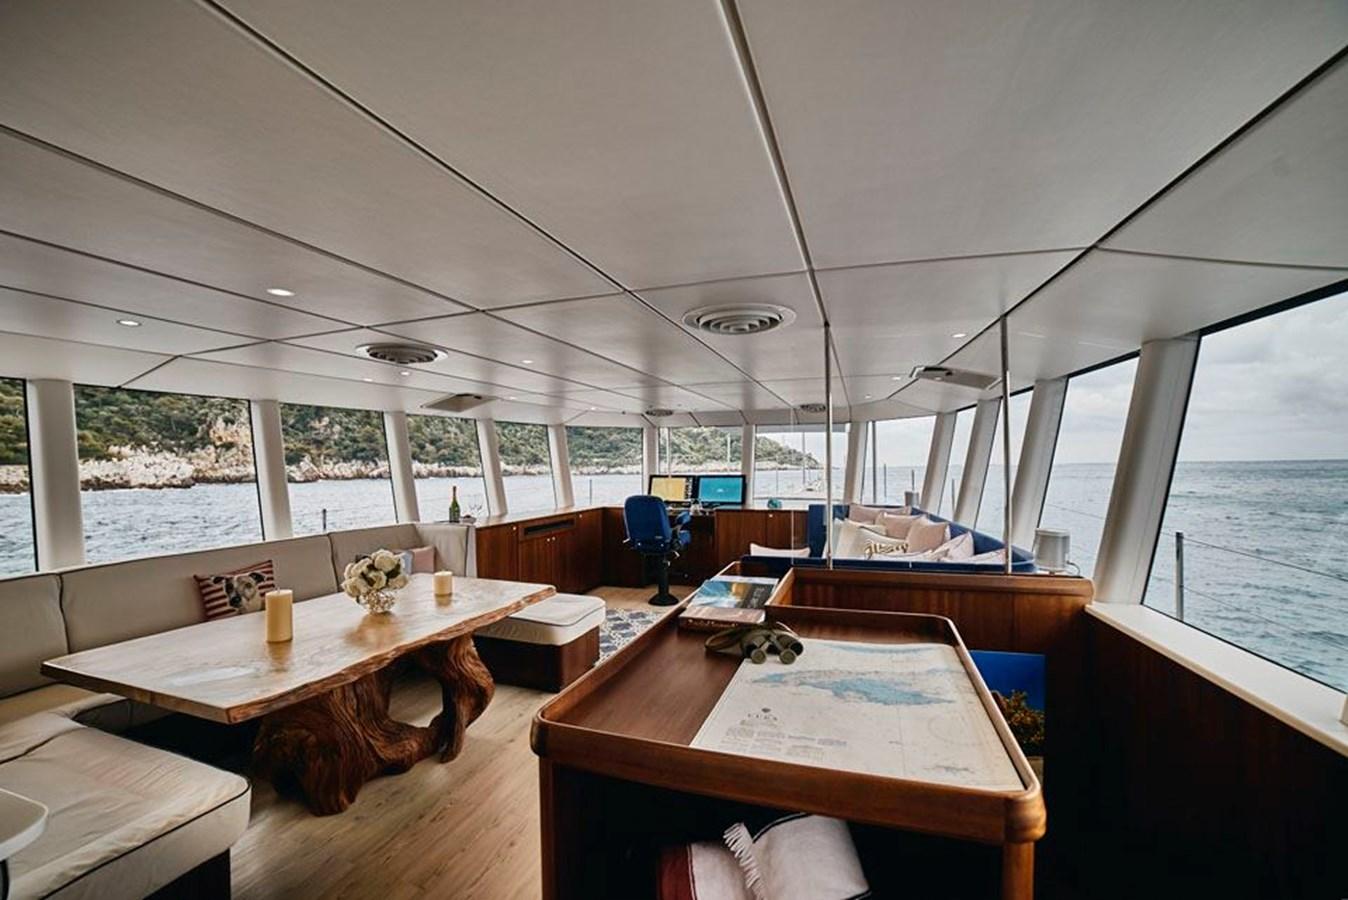 fpb-97-13 2014 CIRCA MARINE FPB 97 Motor Yacht 2788372